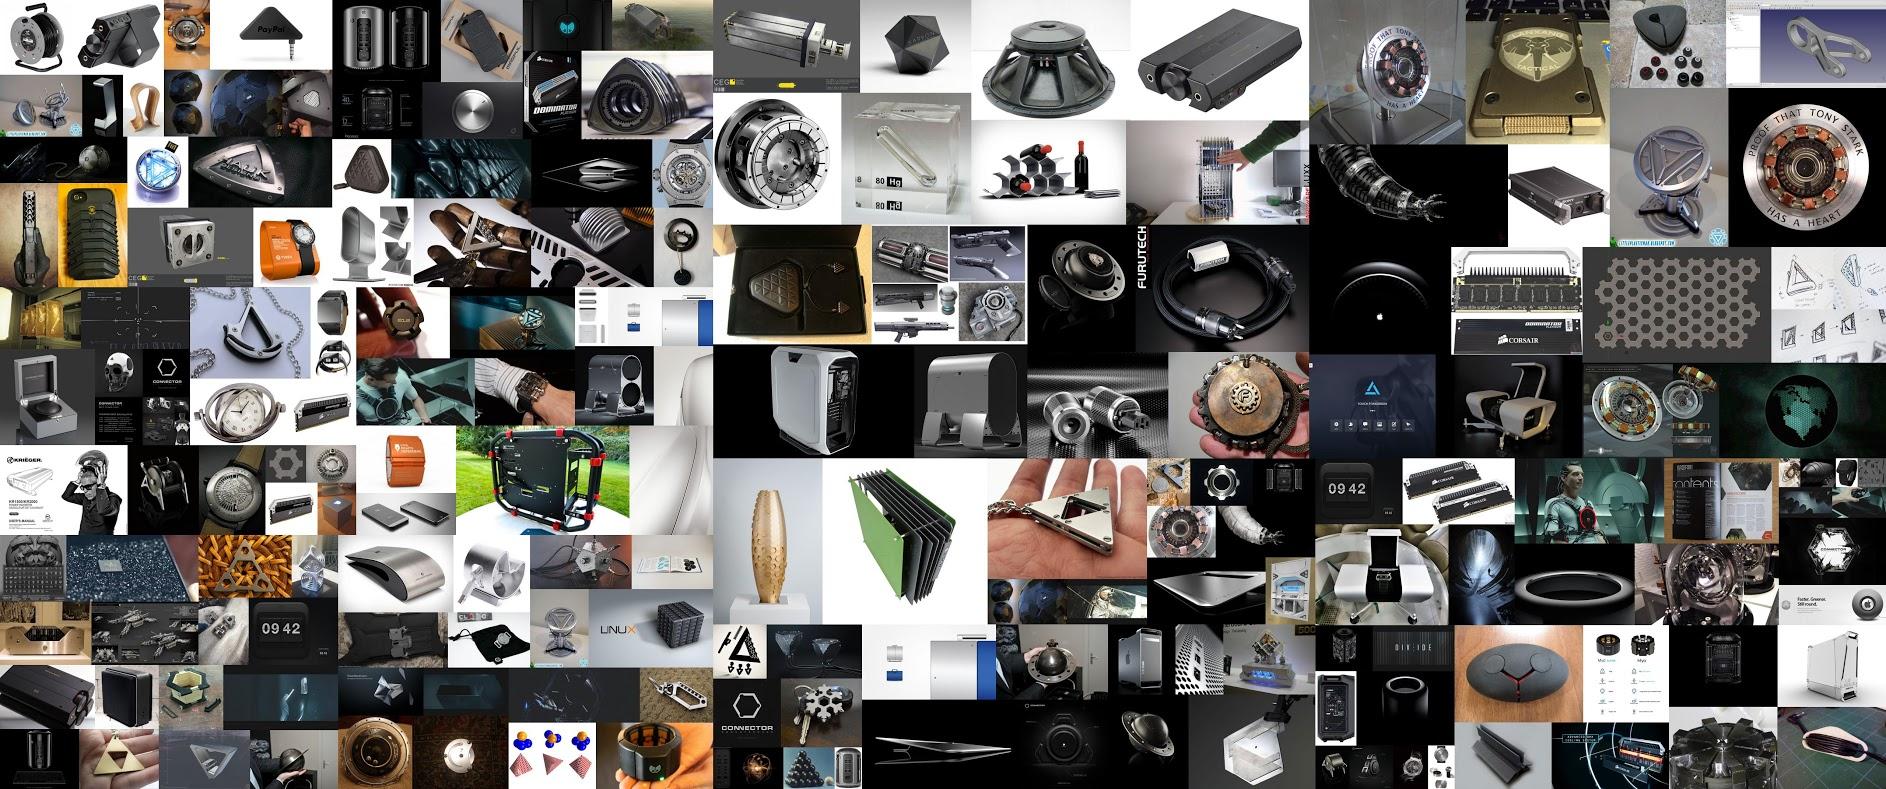 Ivan's design inspirations for the ArtStation awards